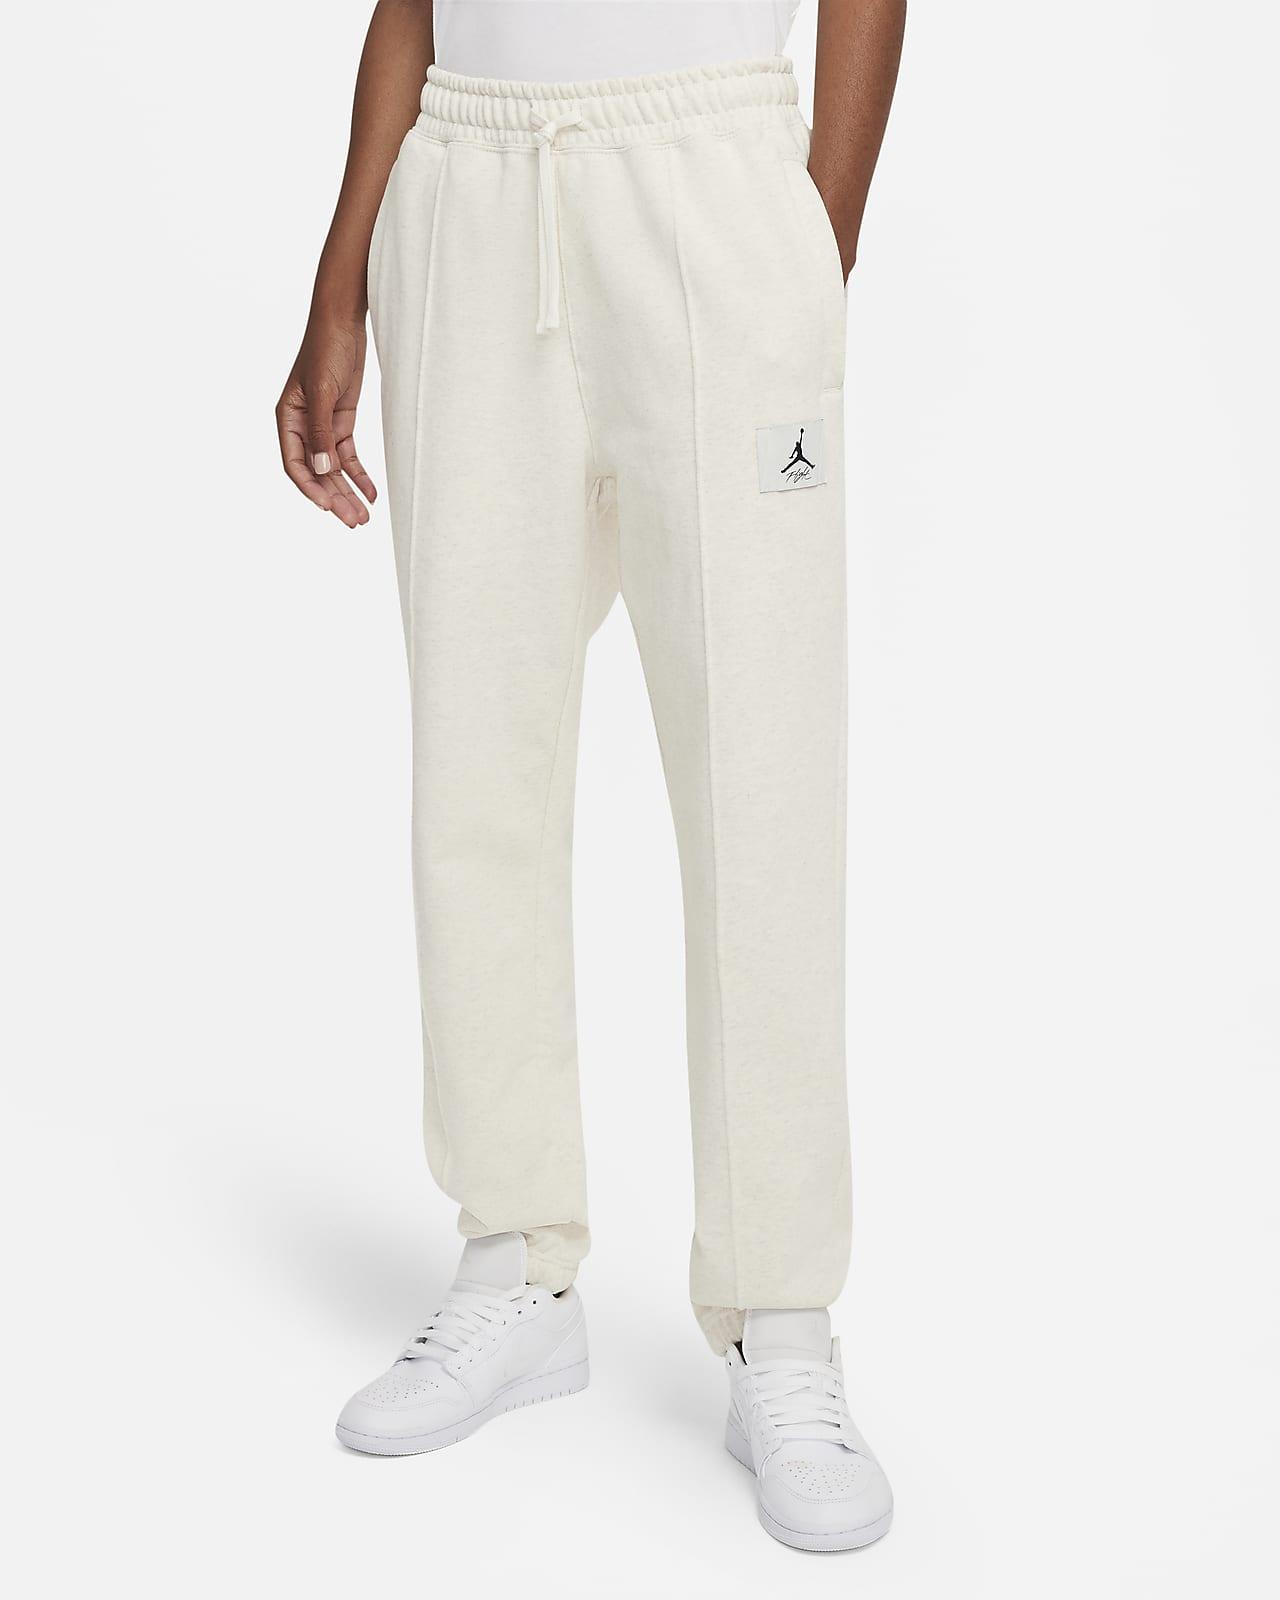 Pantalon en tissu Fleece Jordan Essentials pour Femme